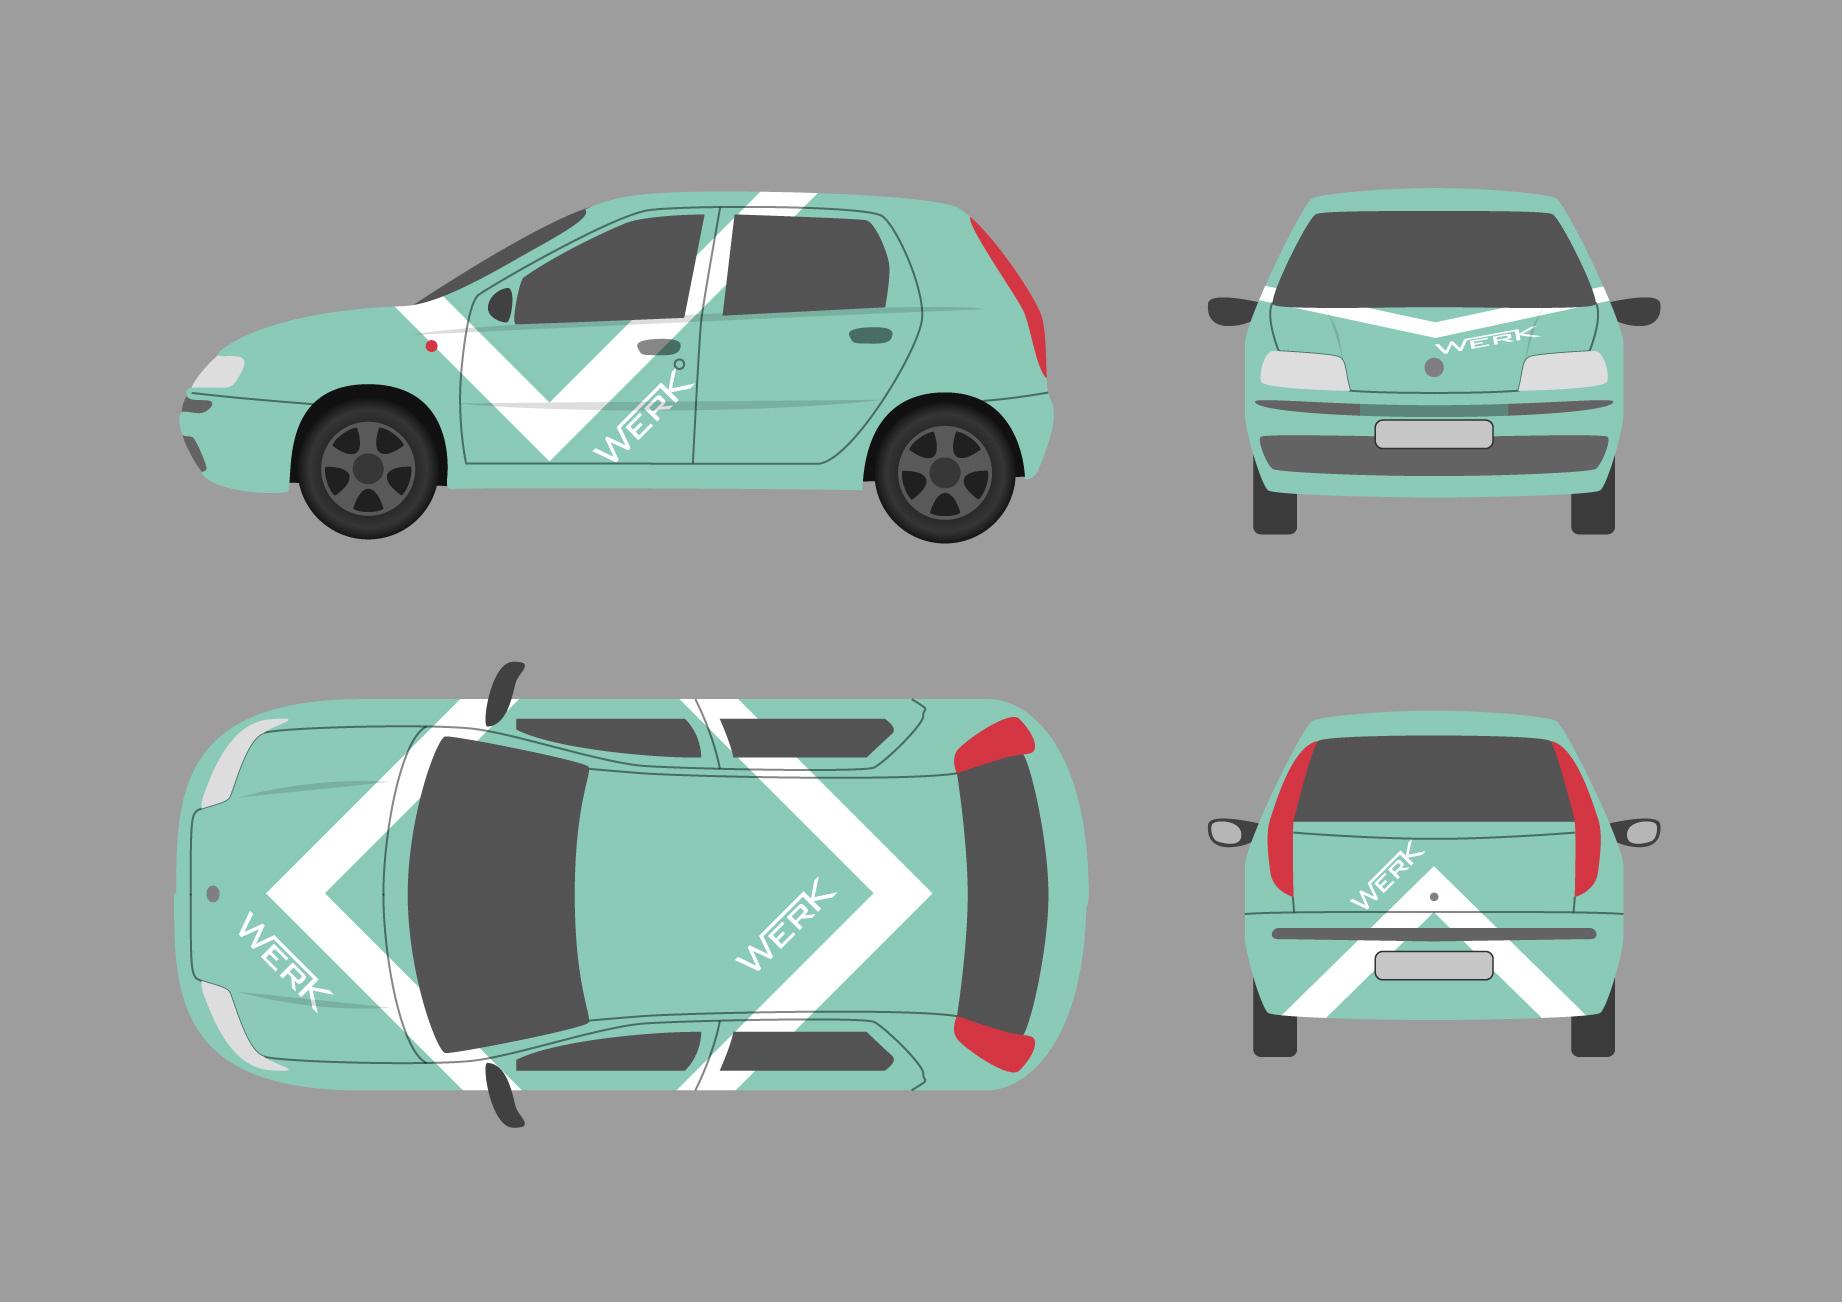 Branding κατασκευής αυτοκινήτων της εταιρείας WERK